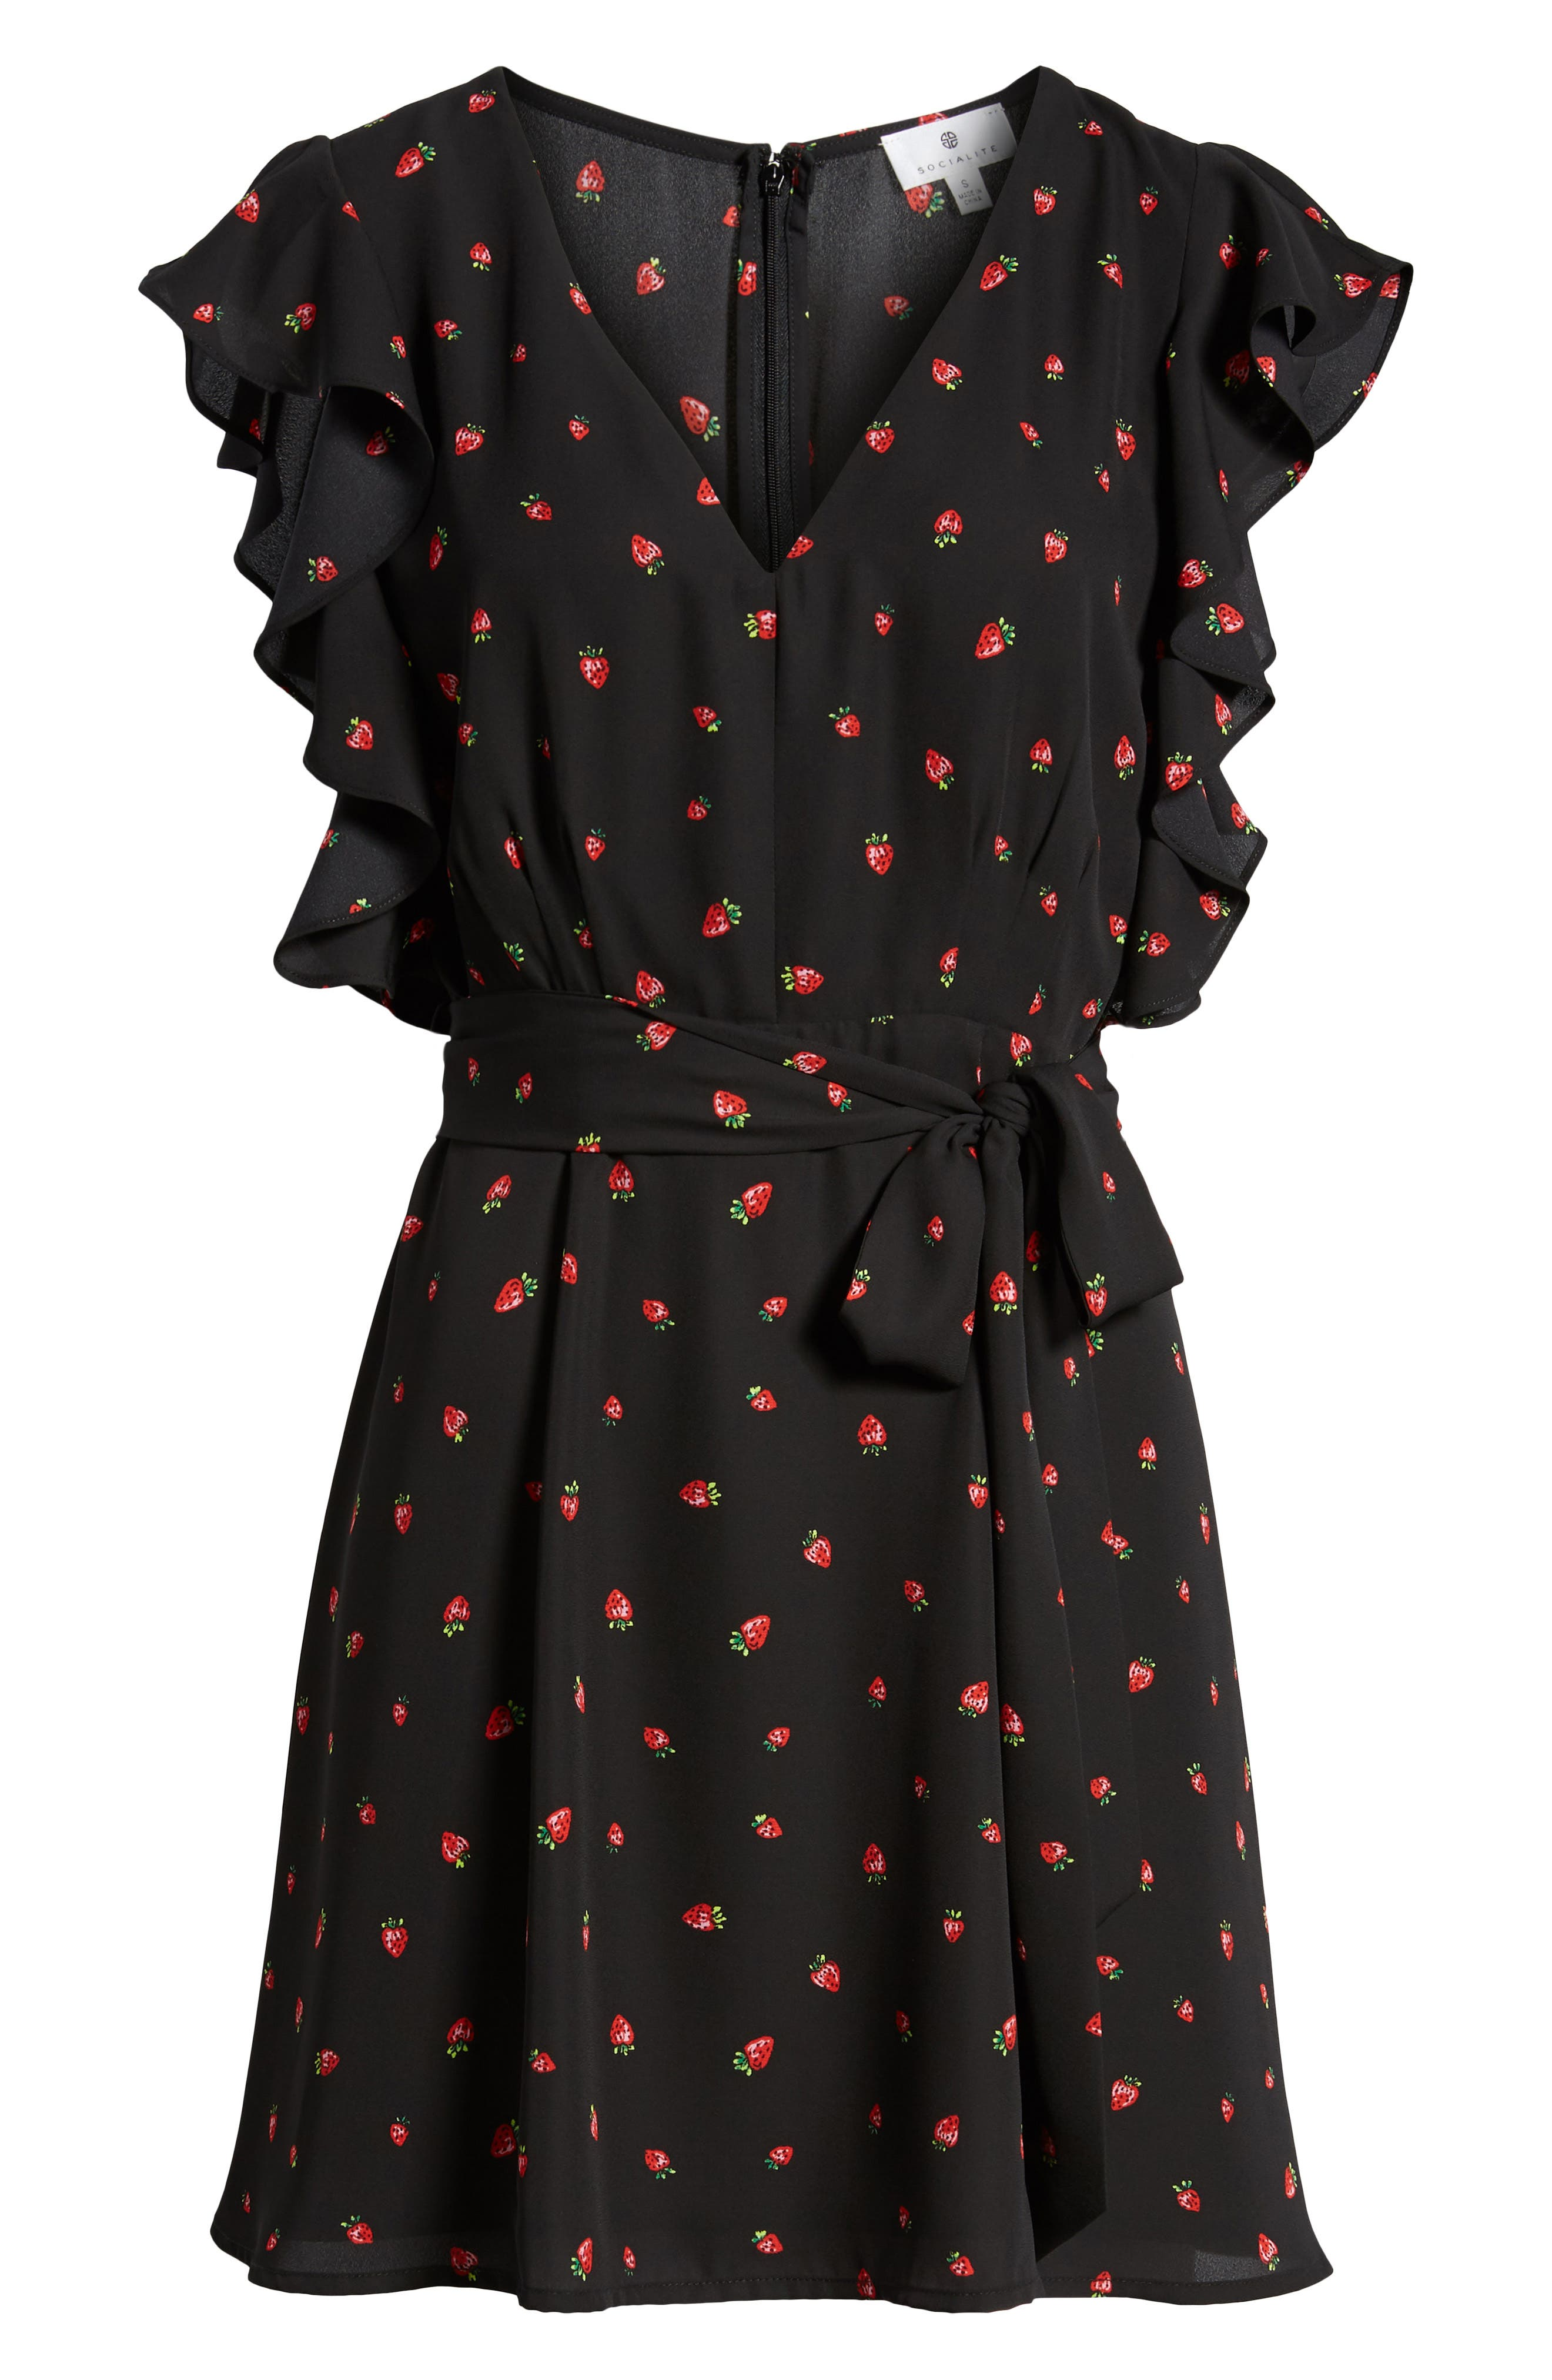 Ruffle Sleeve Dress,                             Alternate thumbnail 7, color,                             001